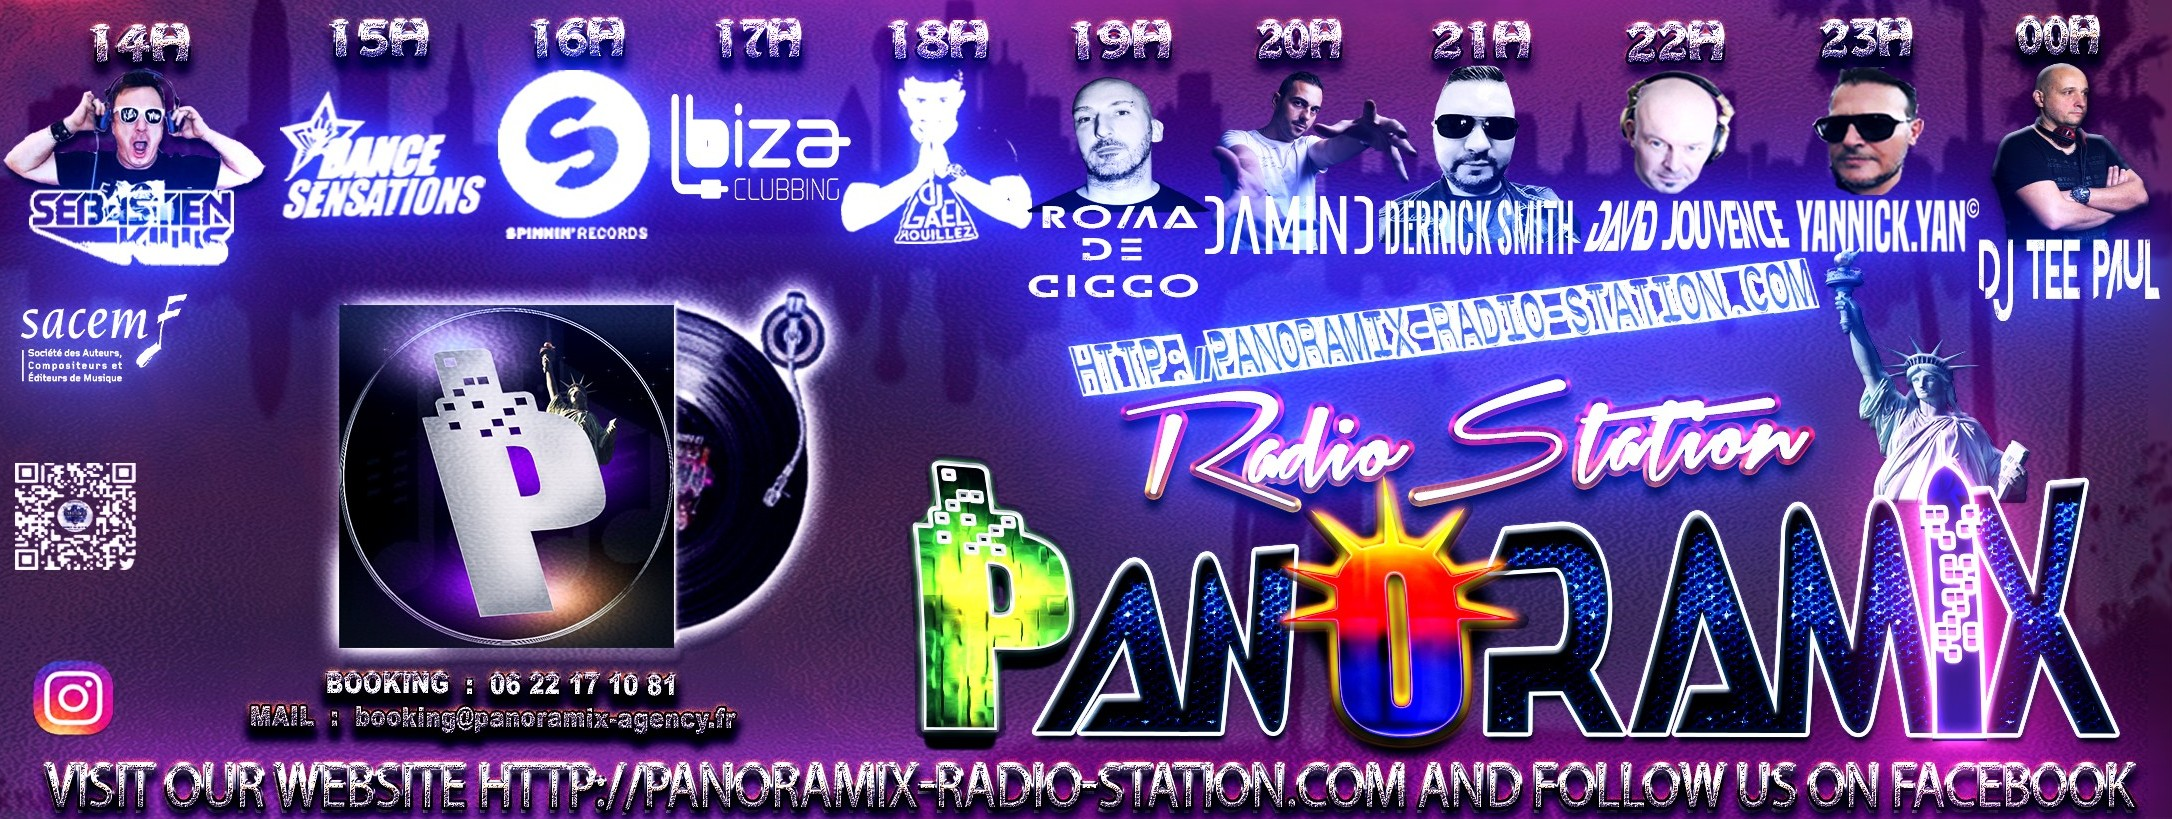 http://panoramix-radio-station.com/wp-content/uploads/2018/06/09-juin-g-2018-PANORAMIX-.jpg